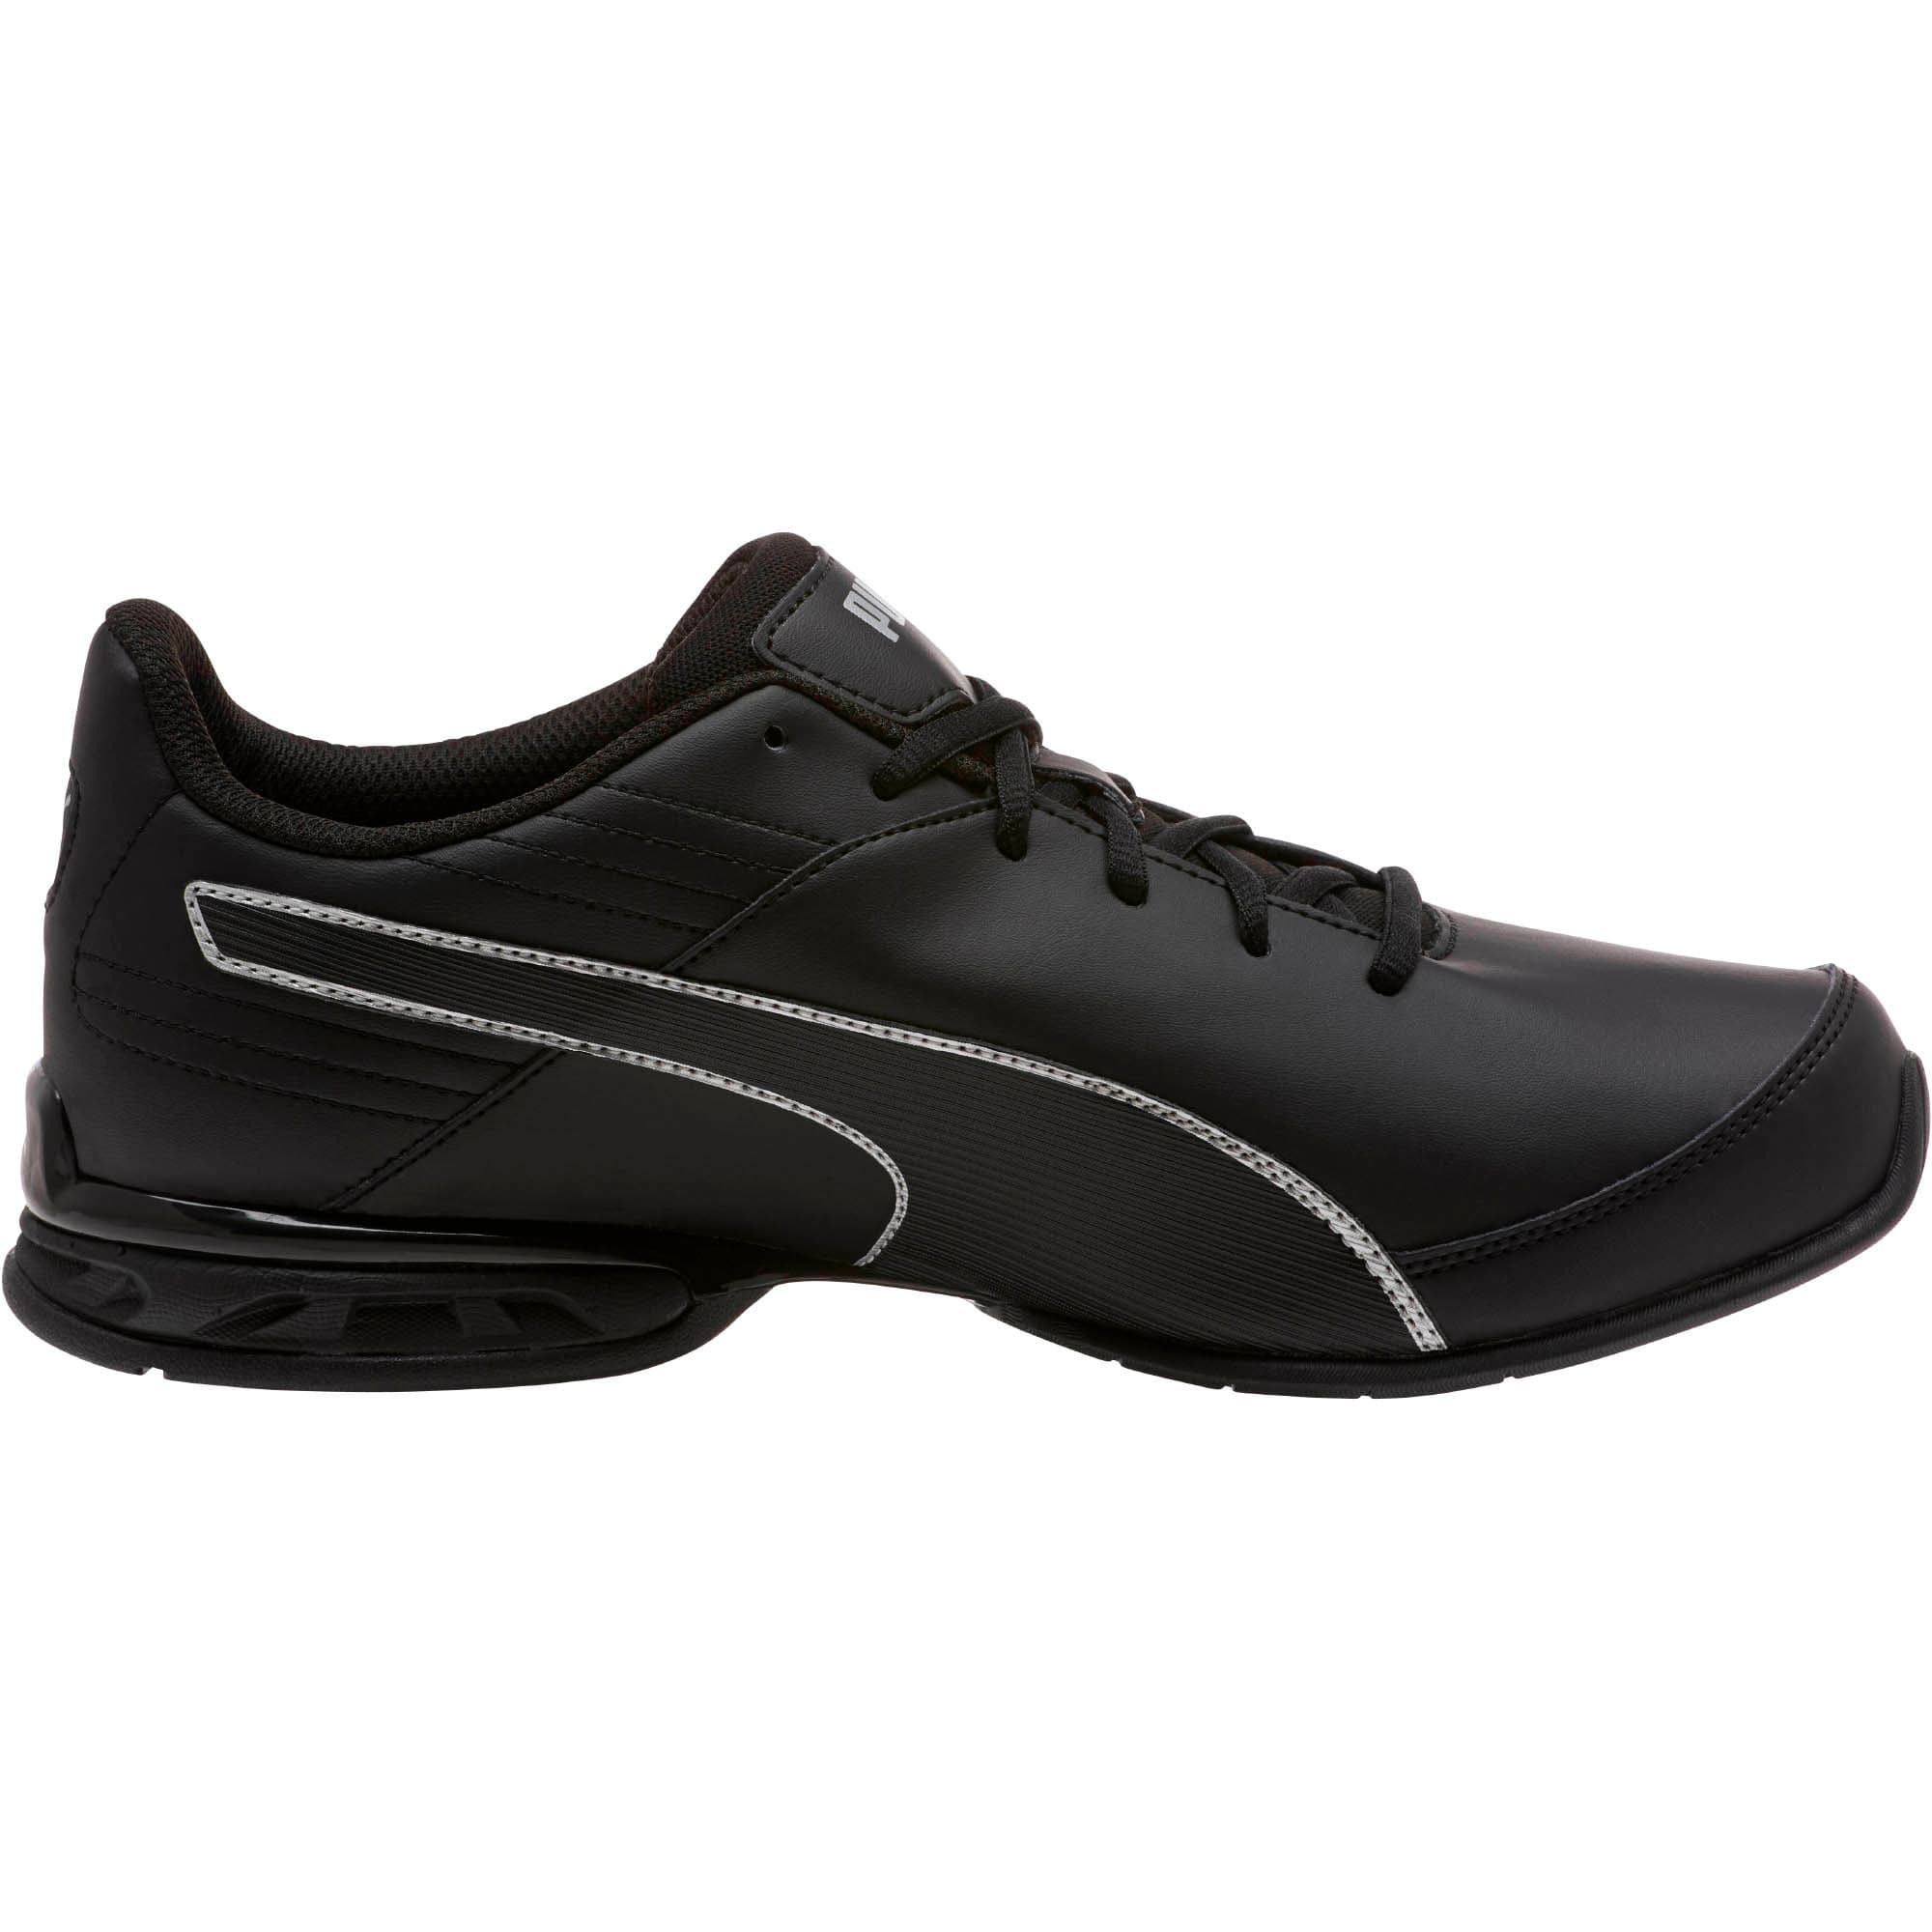 Thumbnail 3 of Super Levitate Men's Running Shoes, Puma Black-Puma Aged Silver, medium